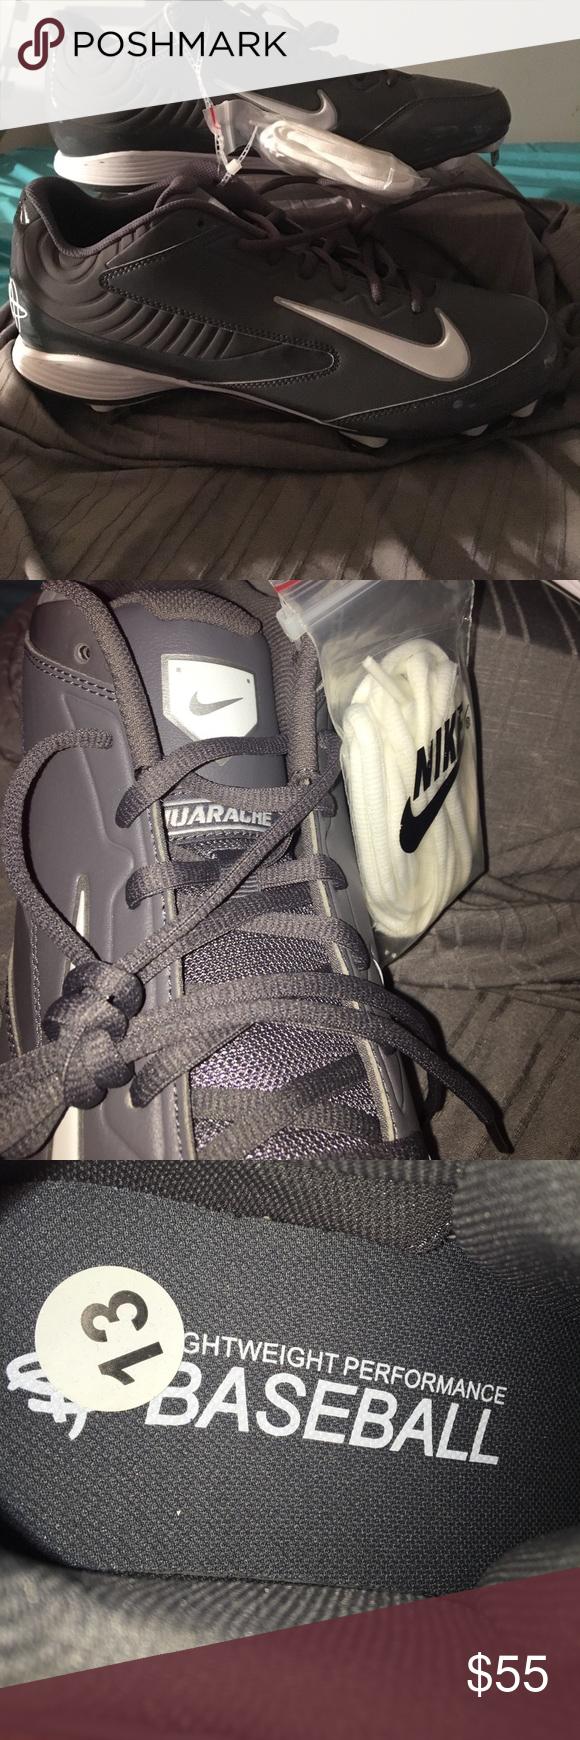 360f21b32c7e Brand new 🔥 Nike huaraches cleats Nwot or box 🔥 Lightweight performance  baseball size 13 cleats